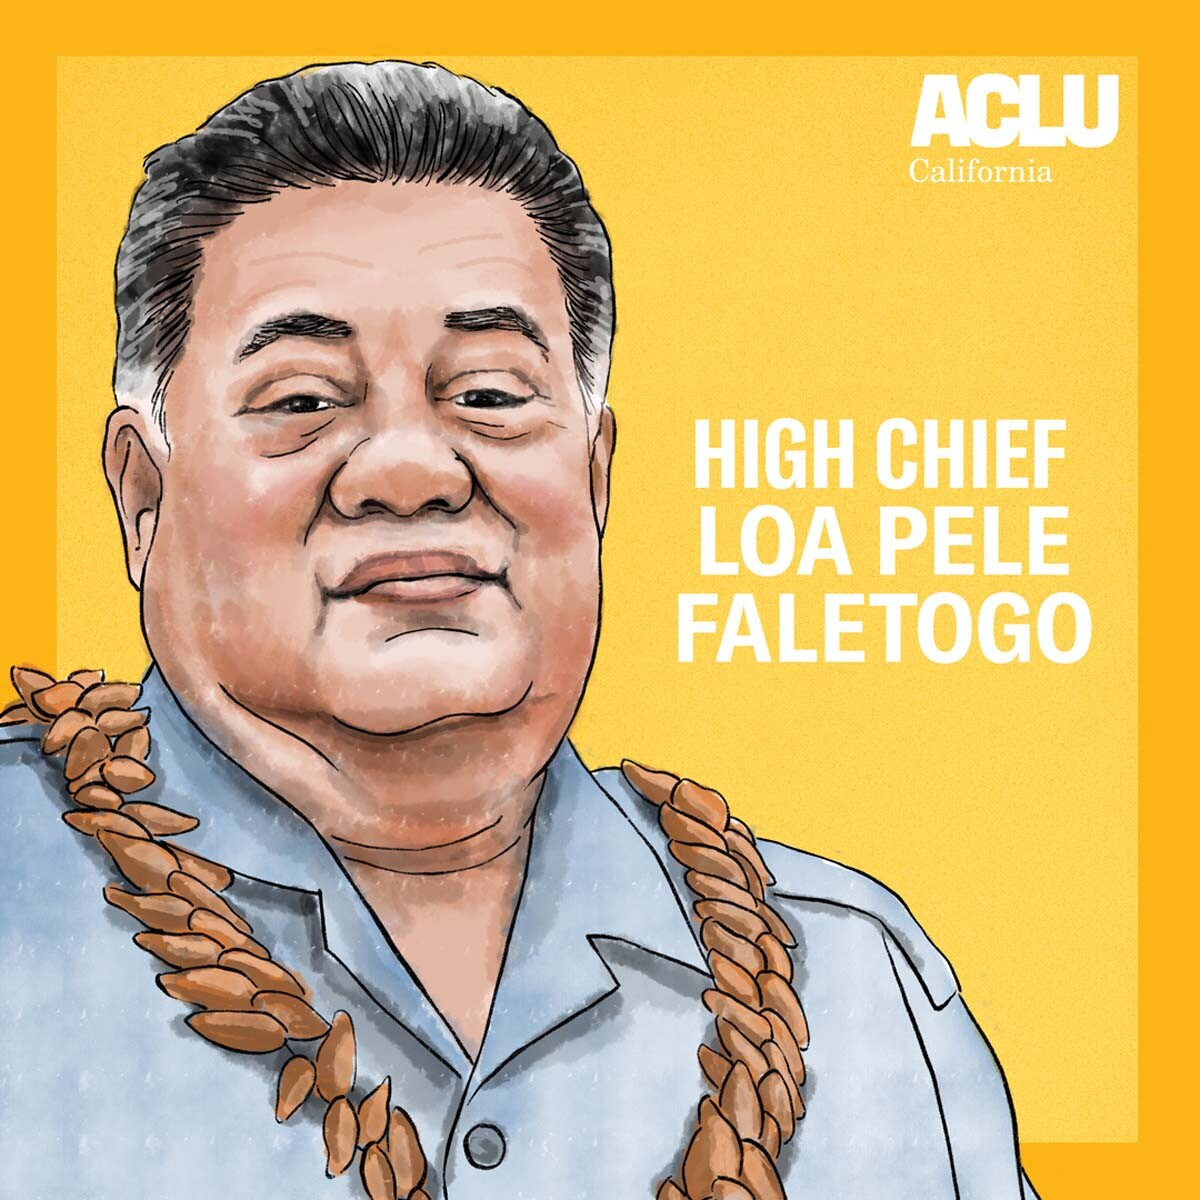 Portrait of High Chief Loa Pele Faletogo | Audrey Chan, ACLU SoCal